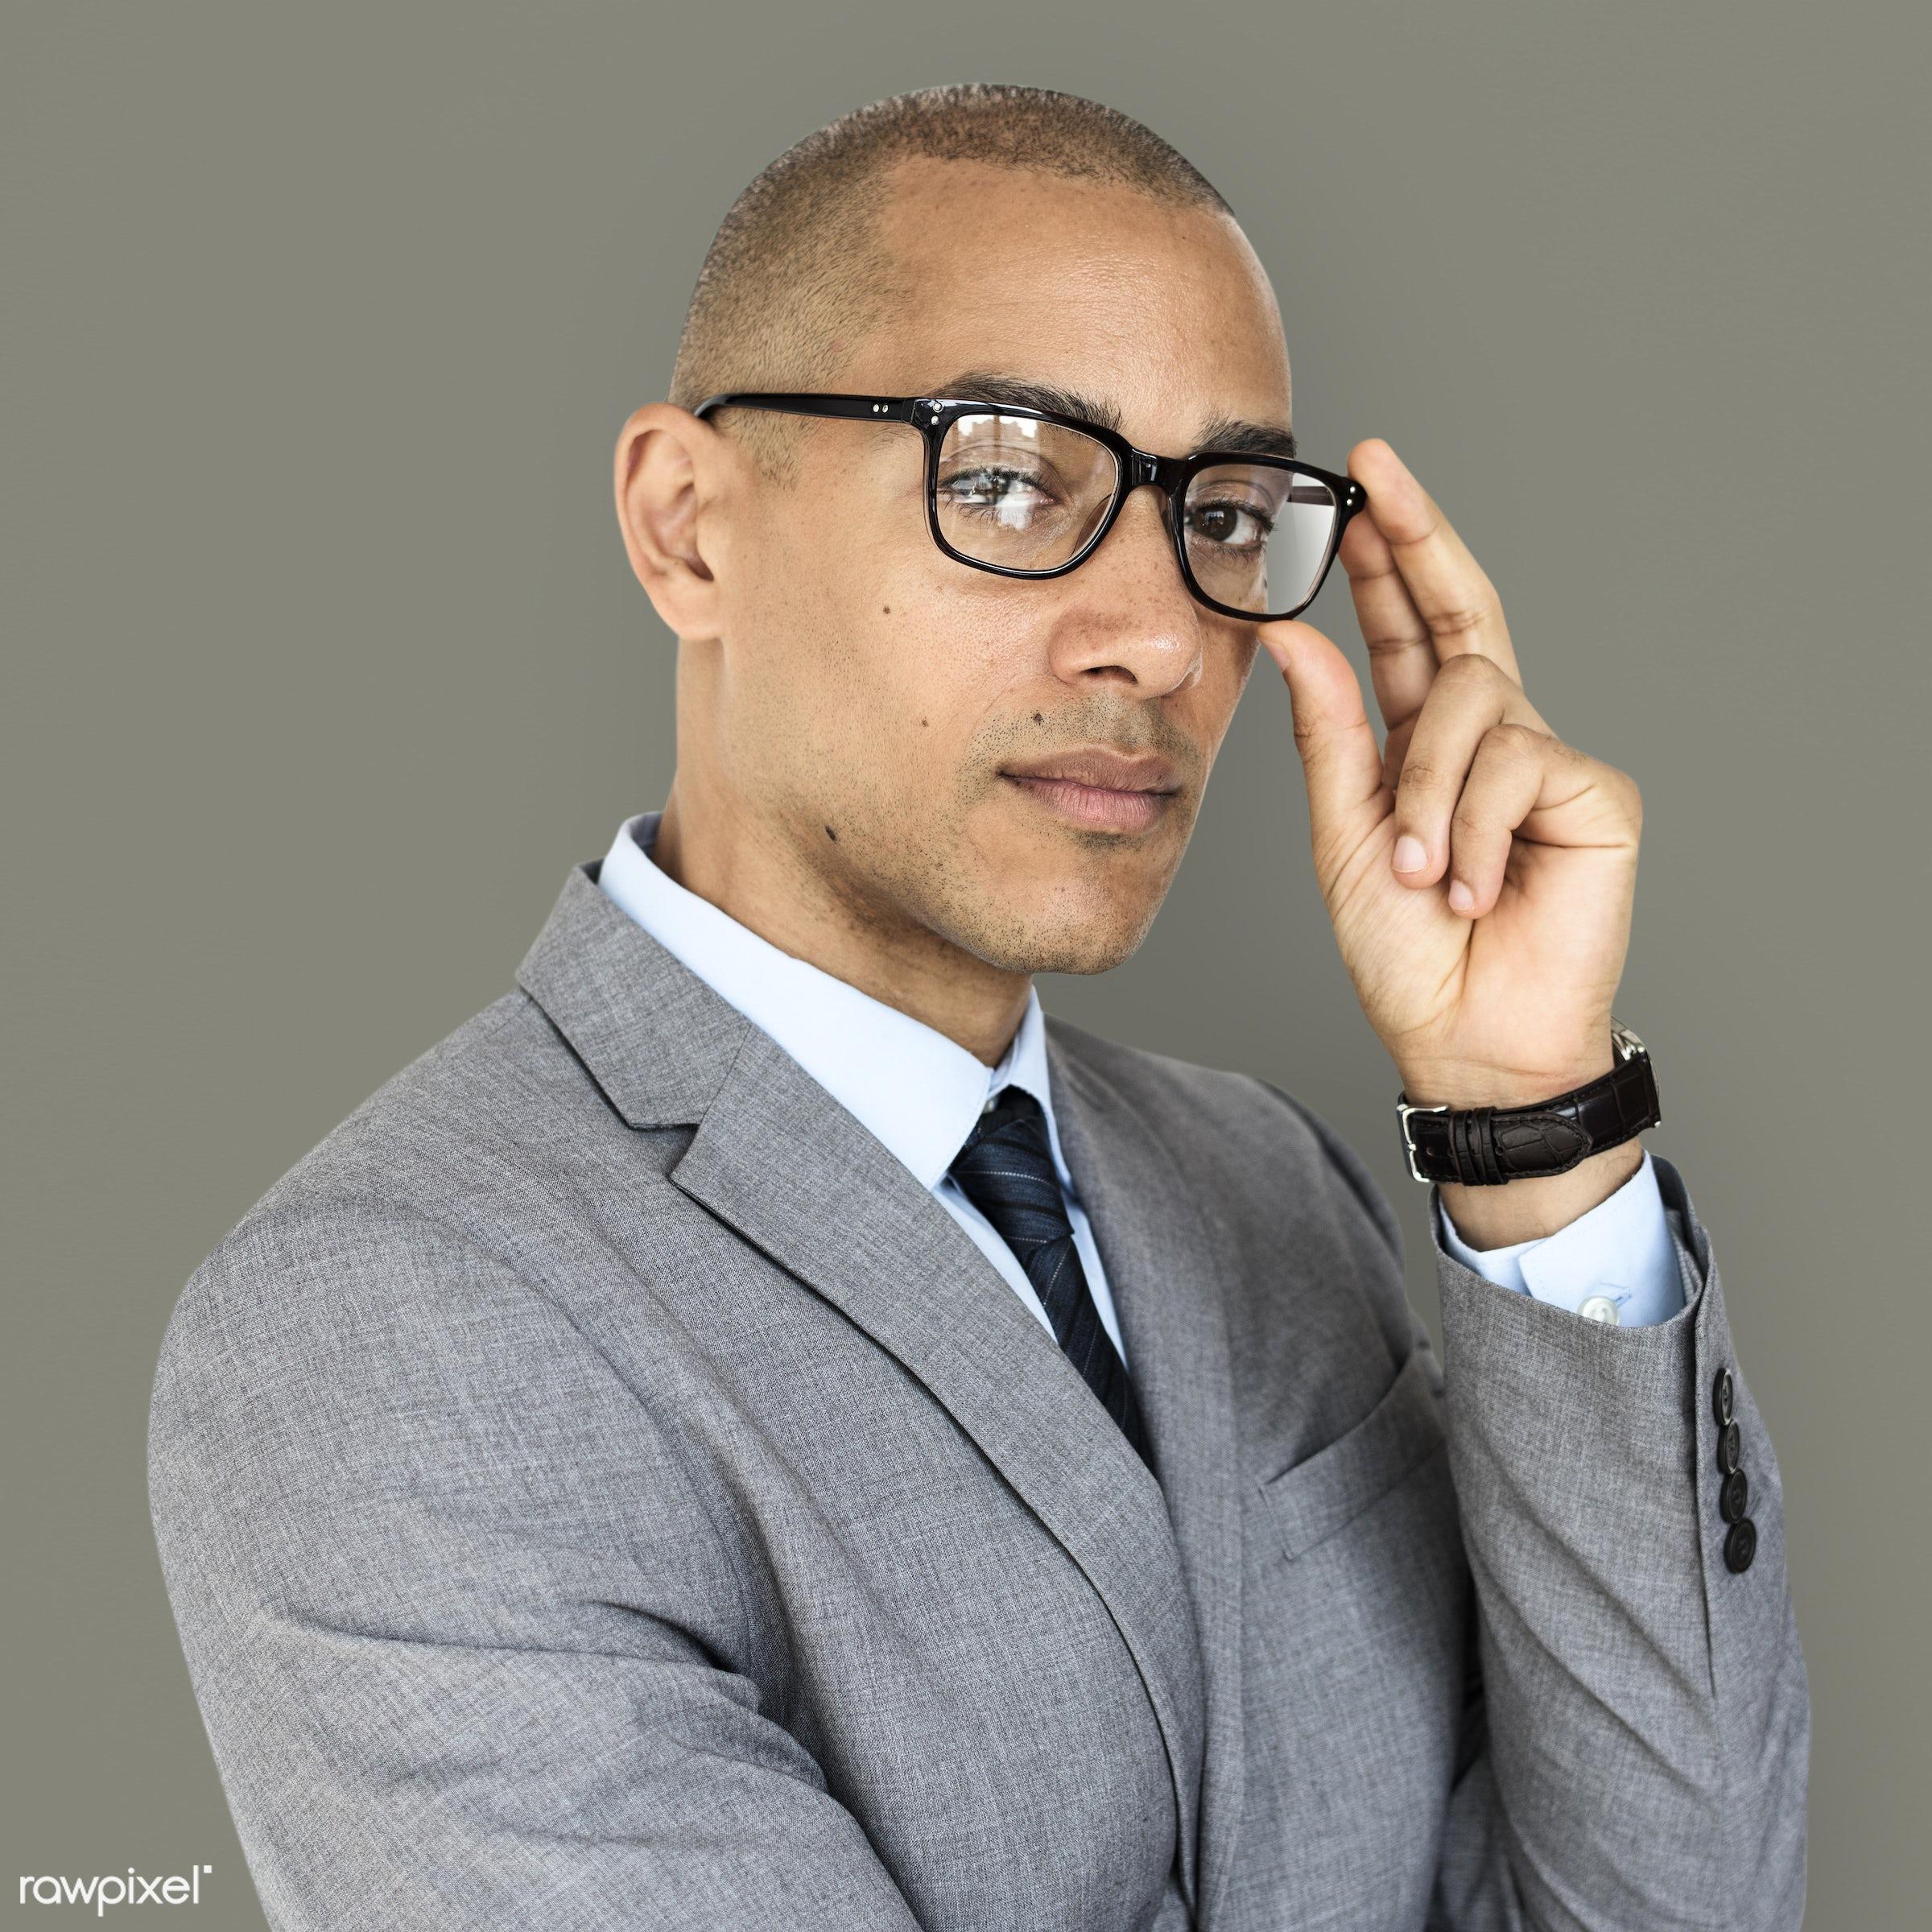 adult, african descent, background, black, business, business man, business wear, expression, focused, formal, formal wear,...